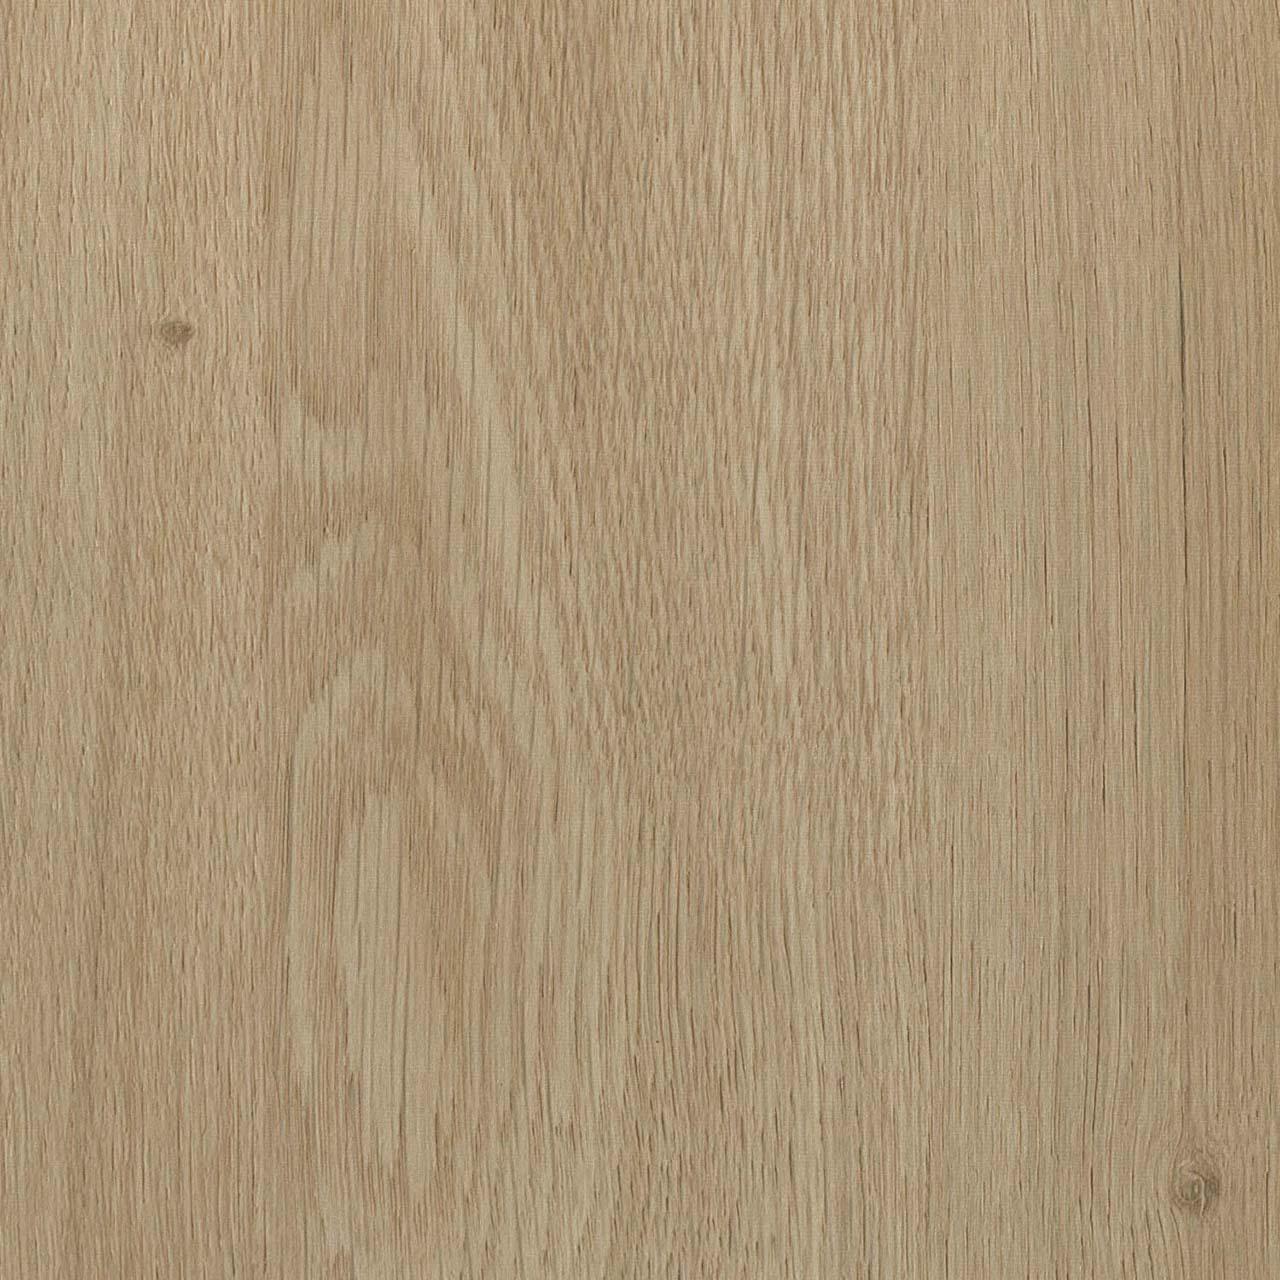 Odessa Oak effect laminate panel